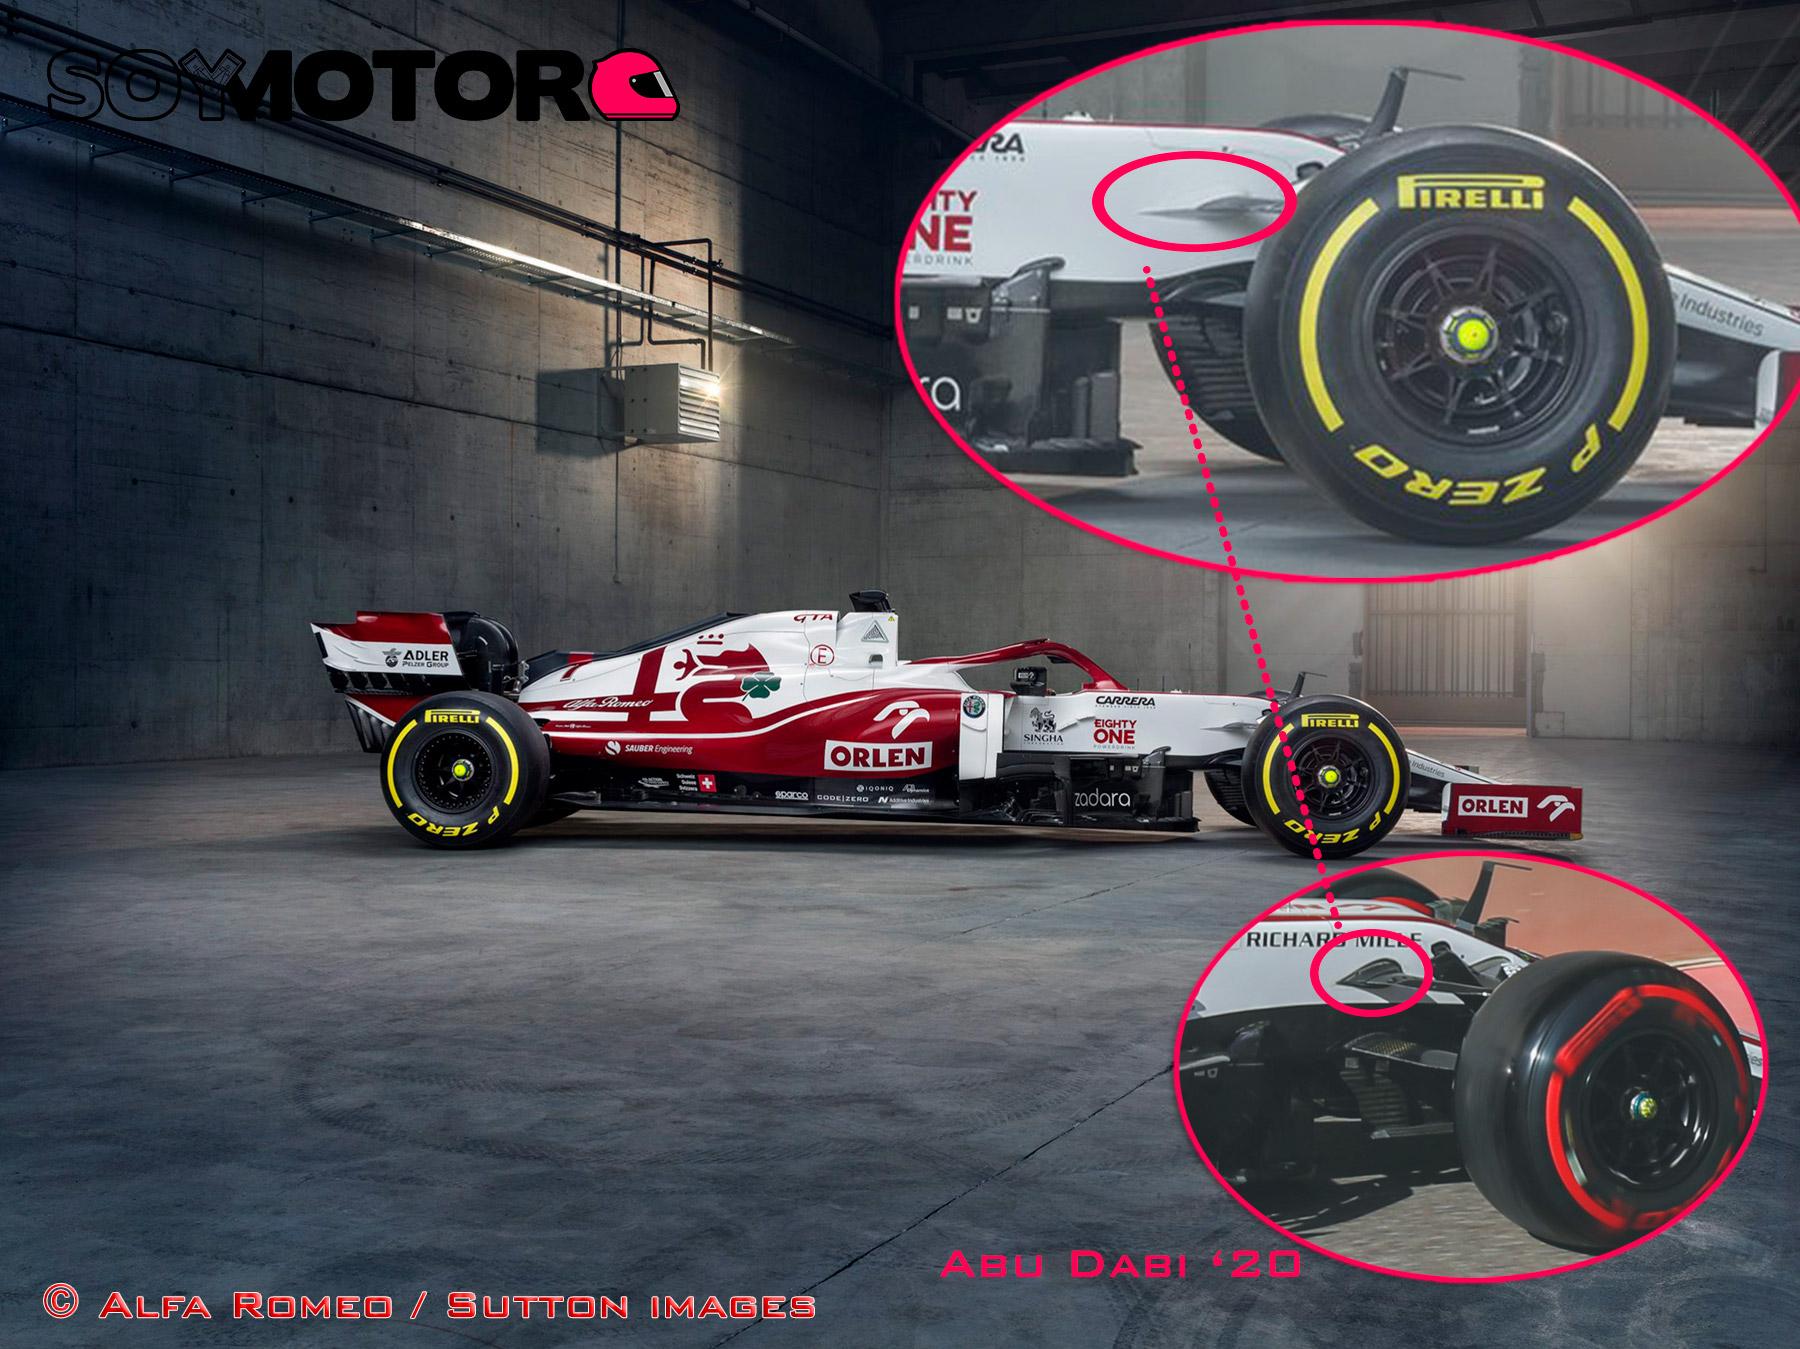 alfa-romeo-c41-suspension-delantera-2-soymotor.jpg